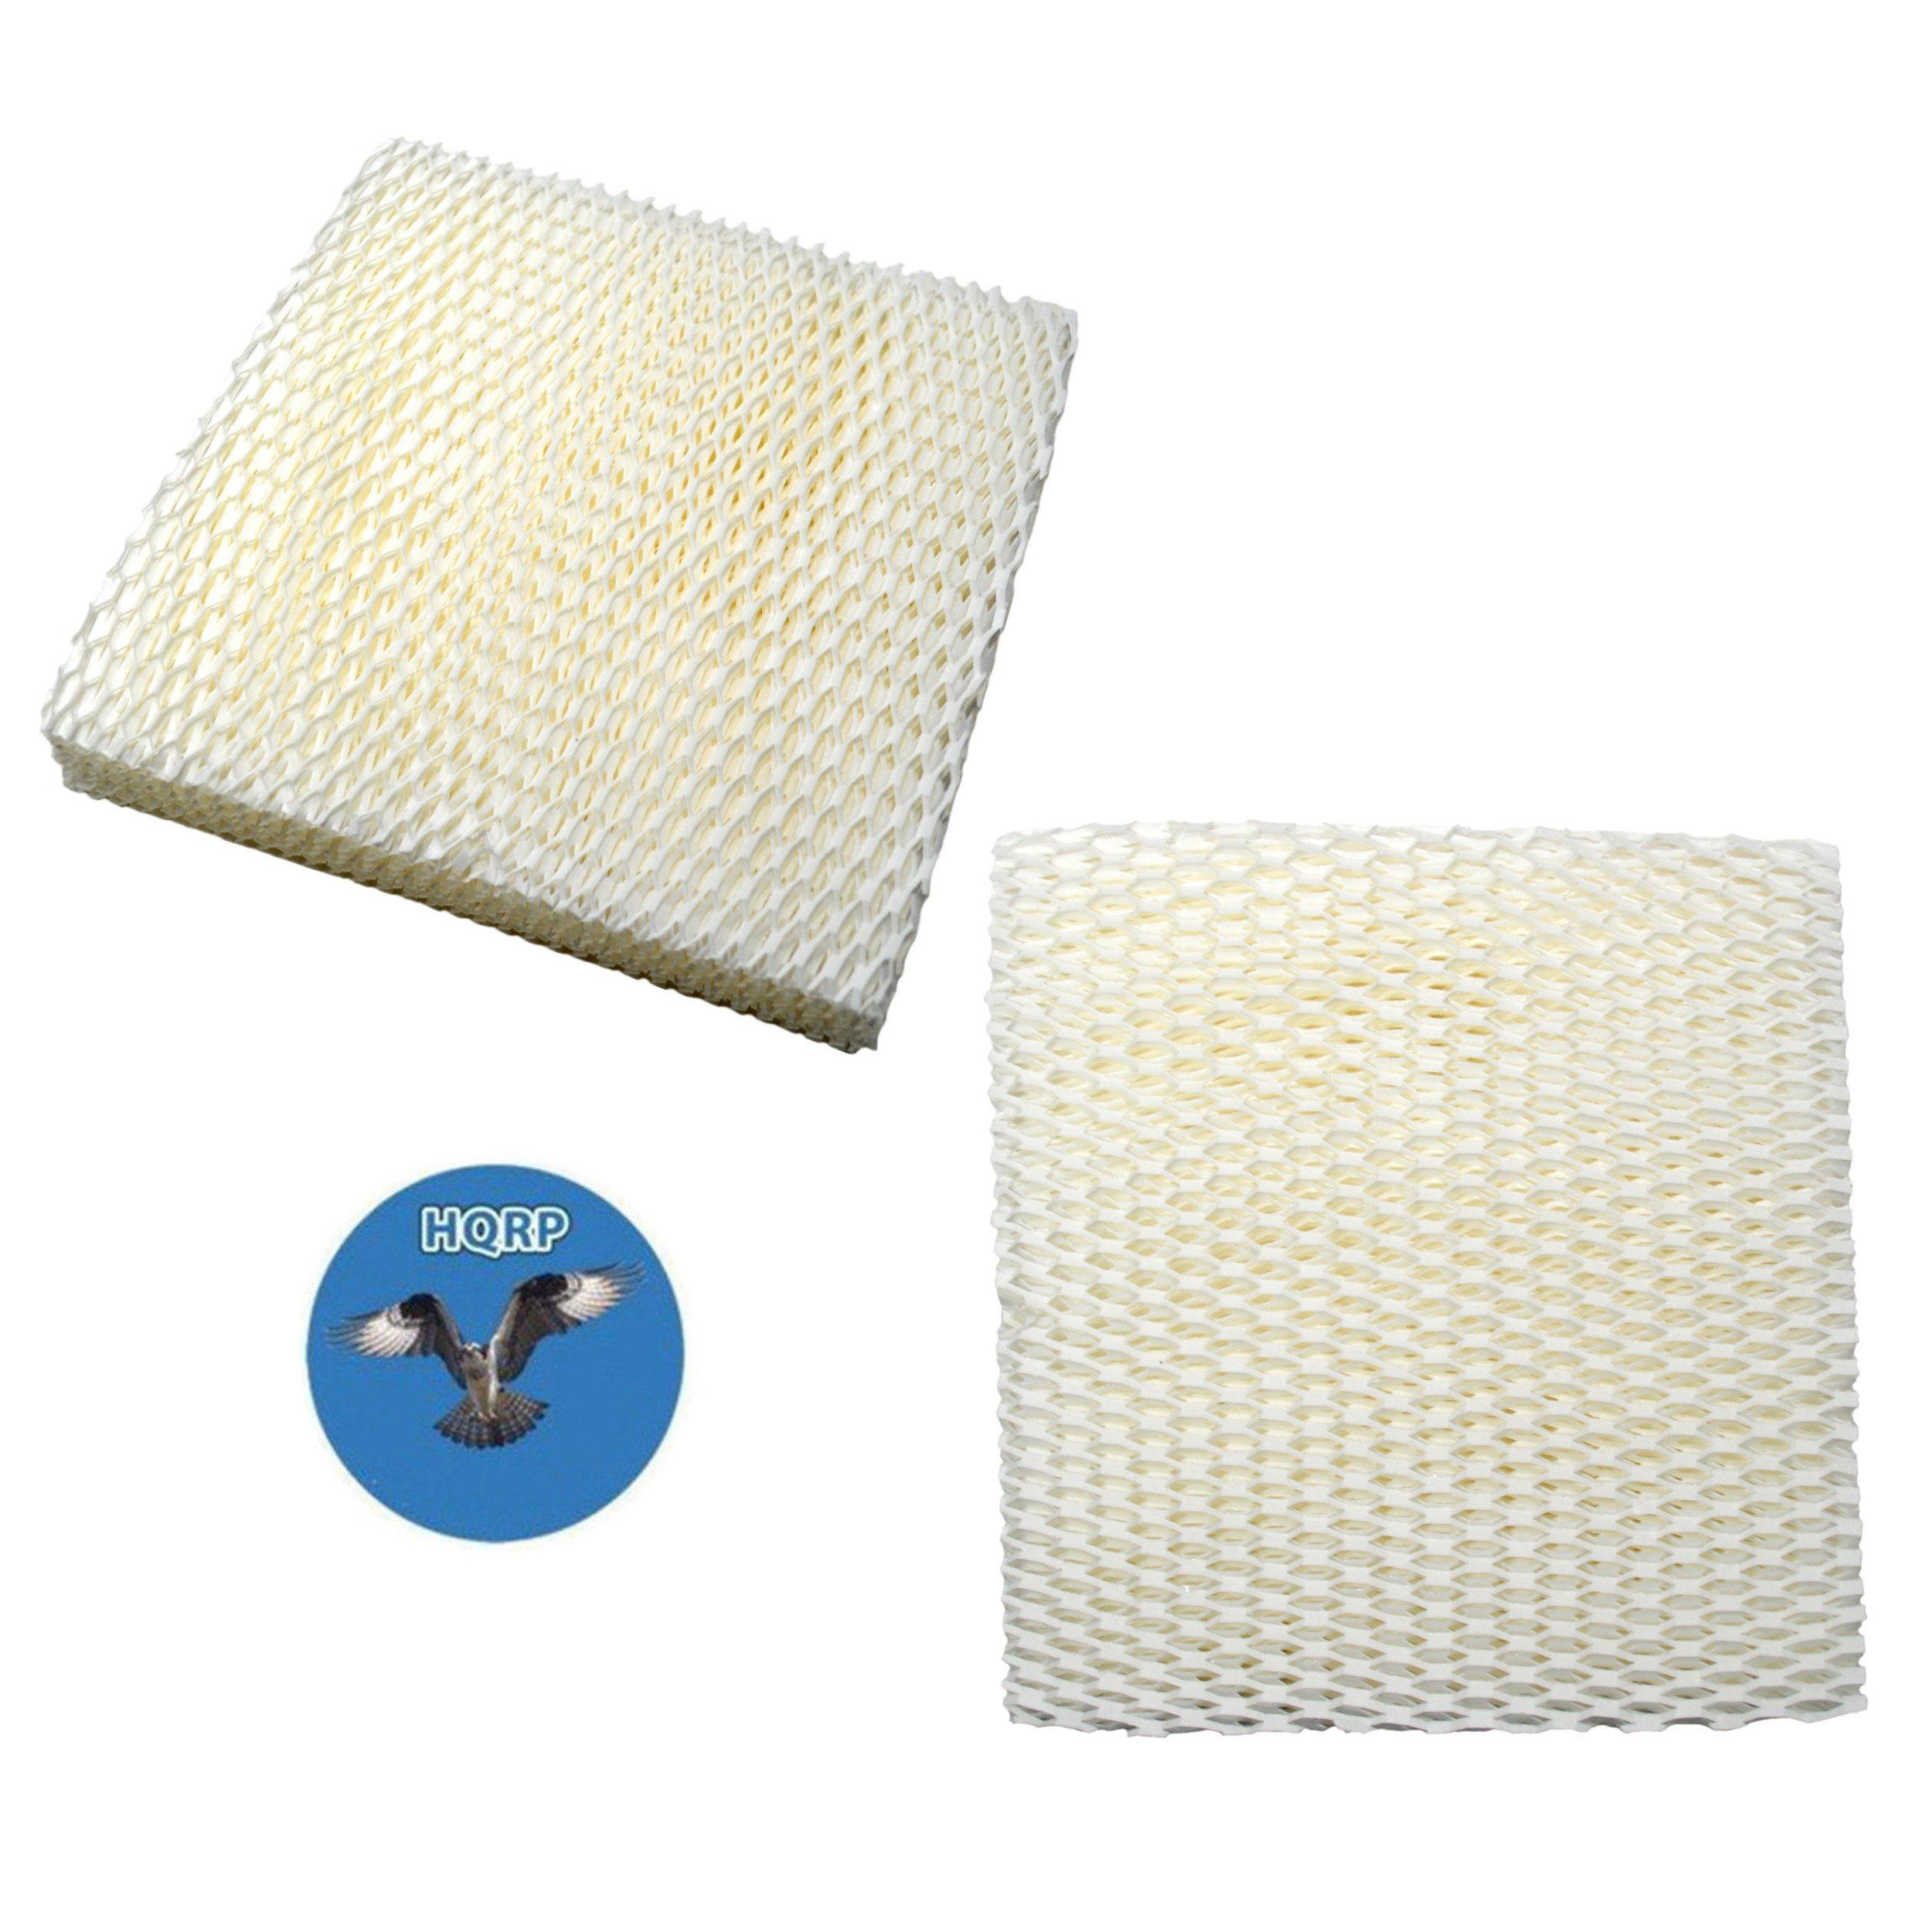 HQRP Wick Filter (2-pack) for Duracraft DH803 / DH804 / DH805 / DH806 / DH807 / DH810 / DH815 / DA1007 Natural Cool Moisture Humidifier, AC-809 / D09-C / AC-815 Replacement + HQRP Coaster